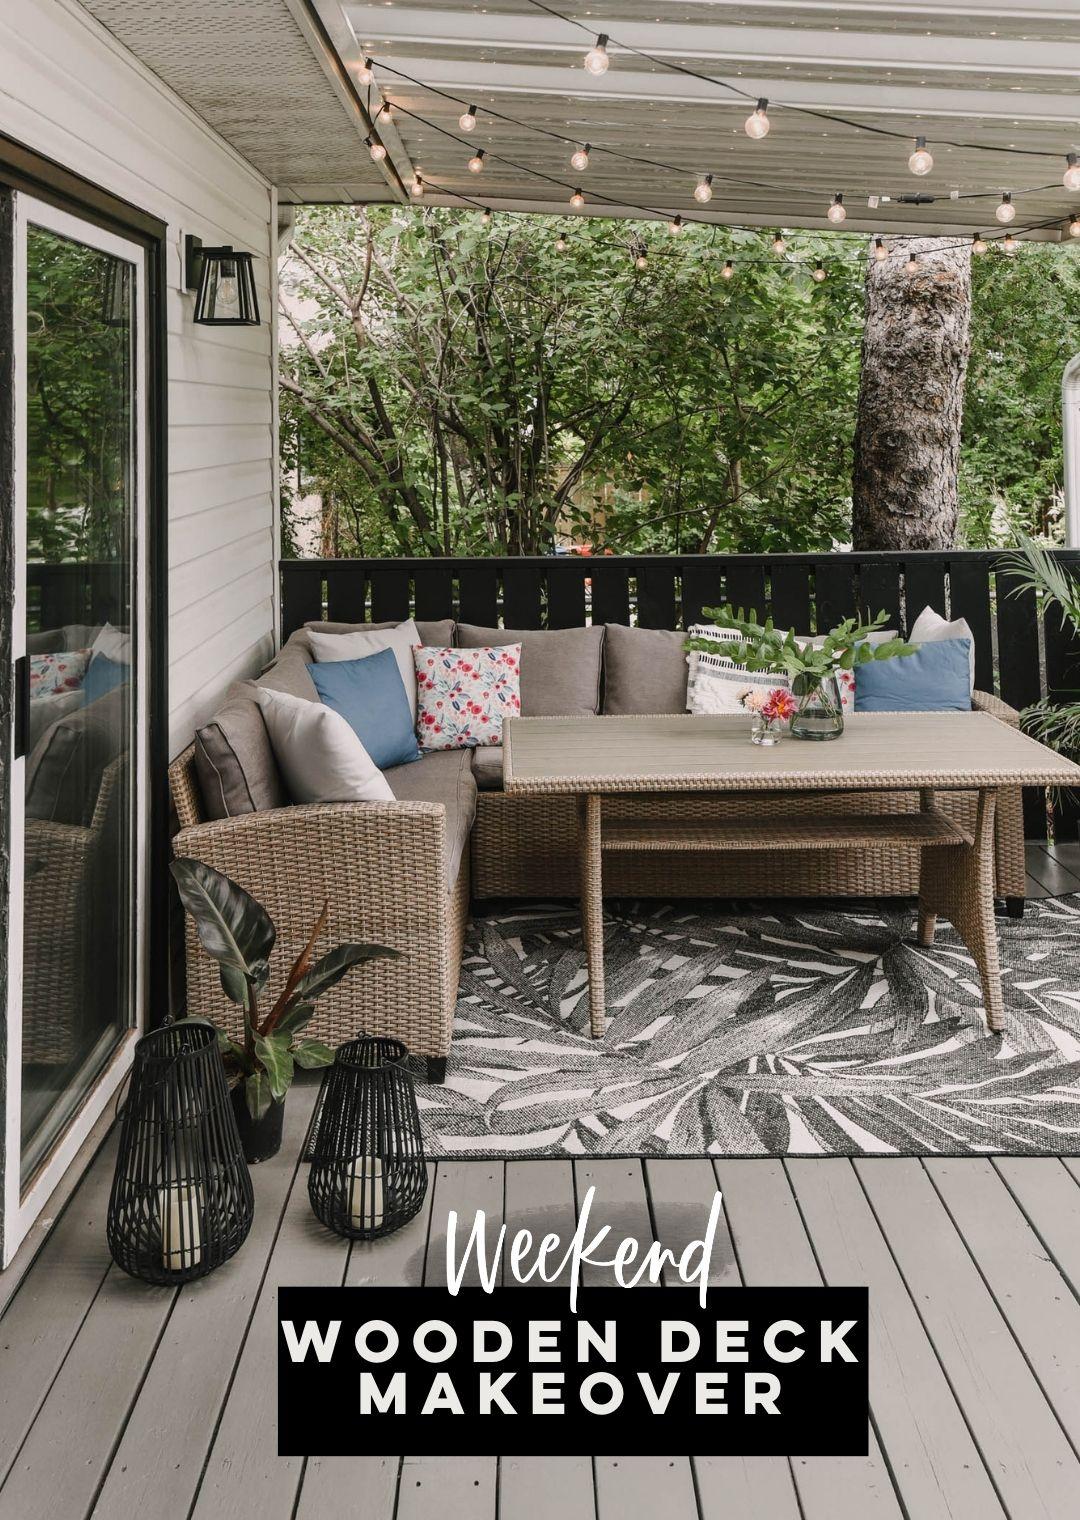 Weekend wooden deck makeover